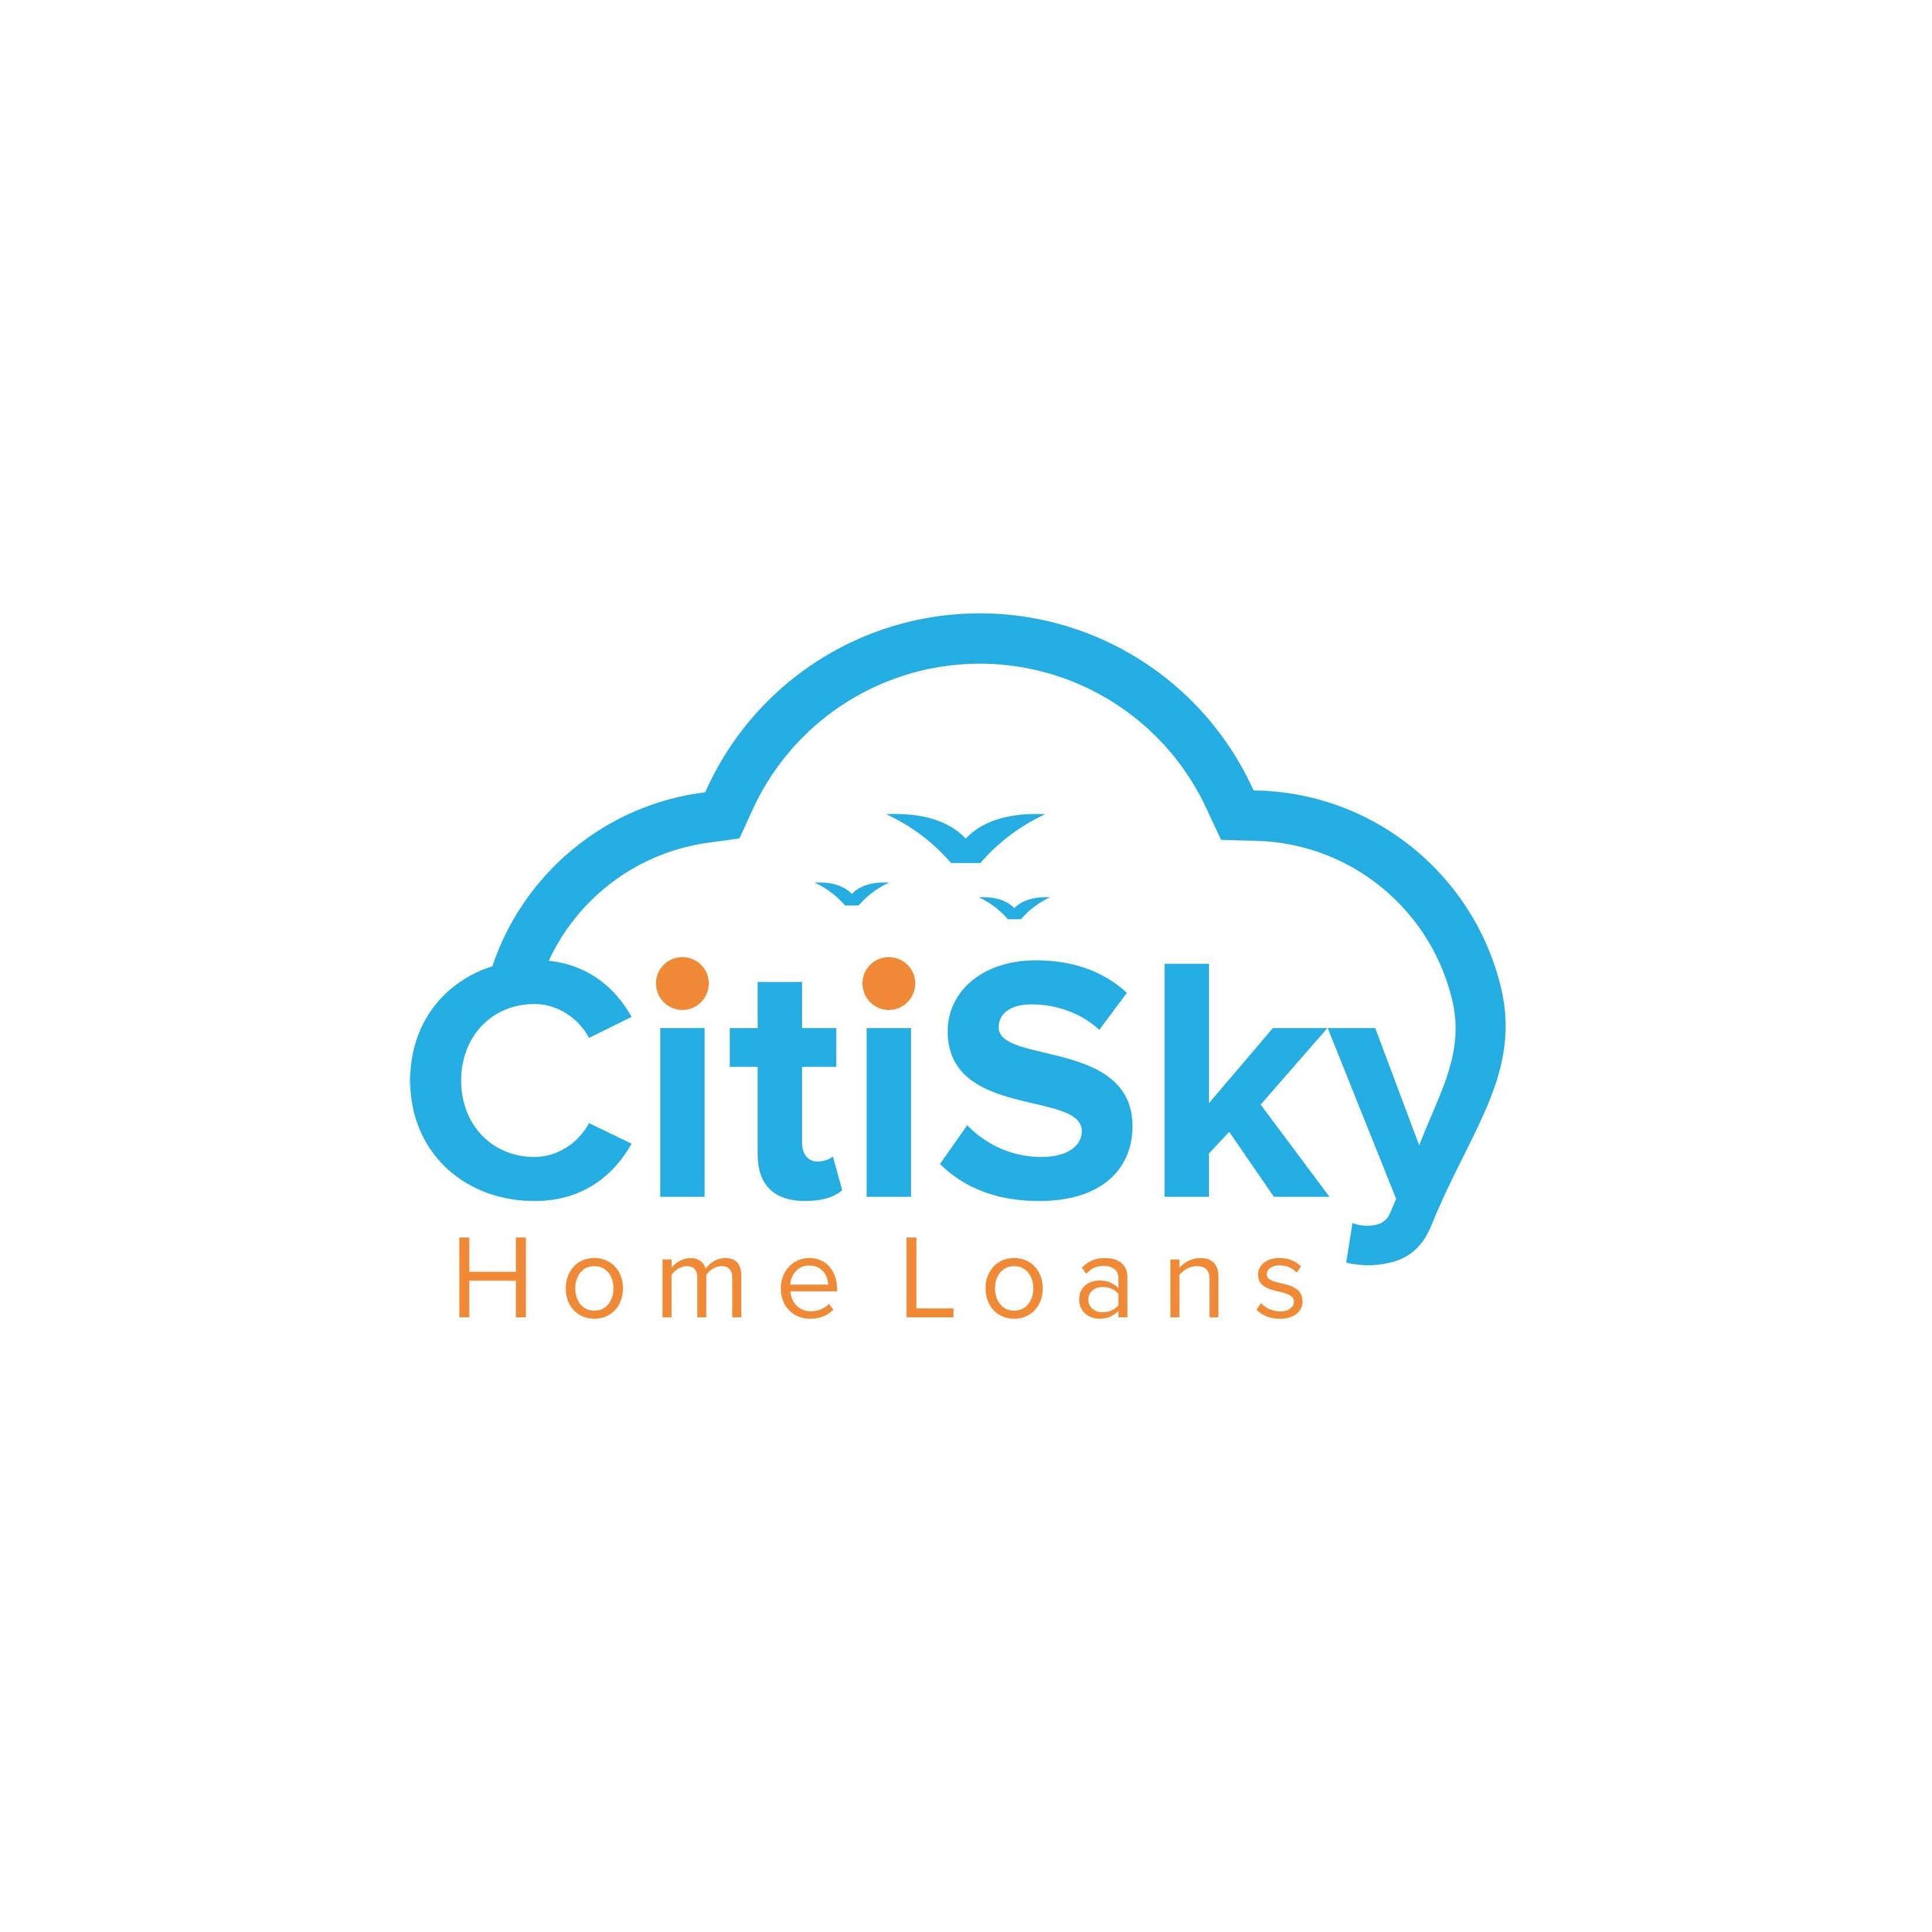 CitiSky Home Loans